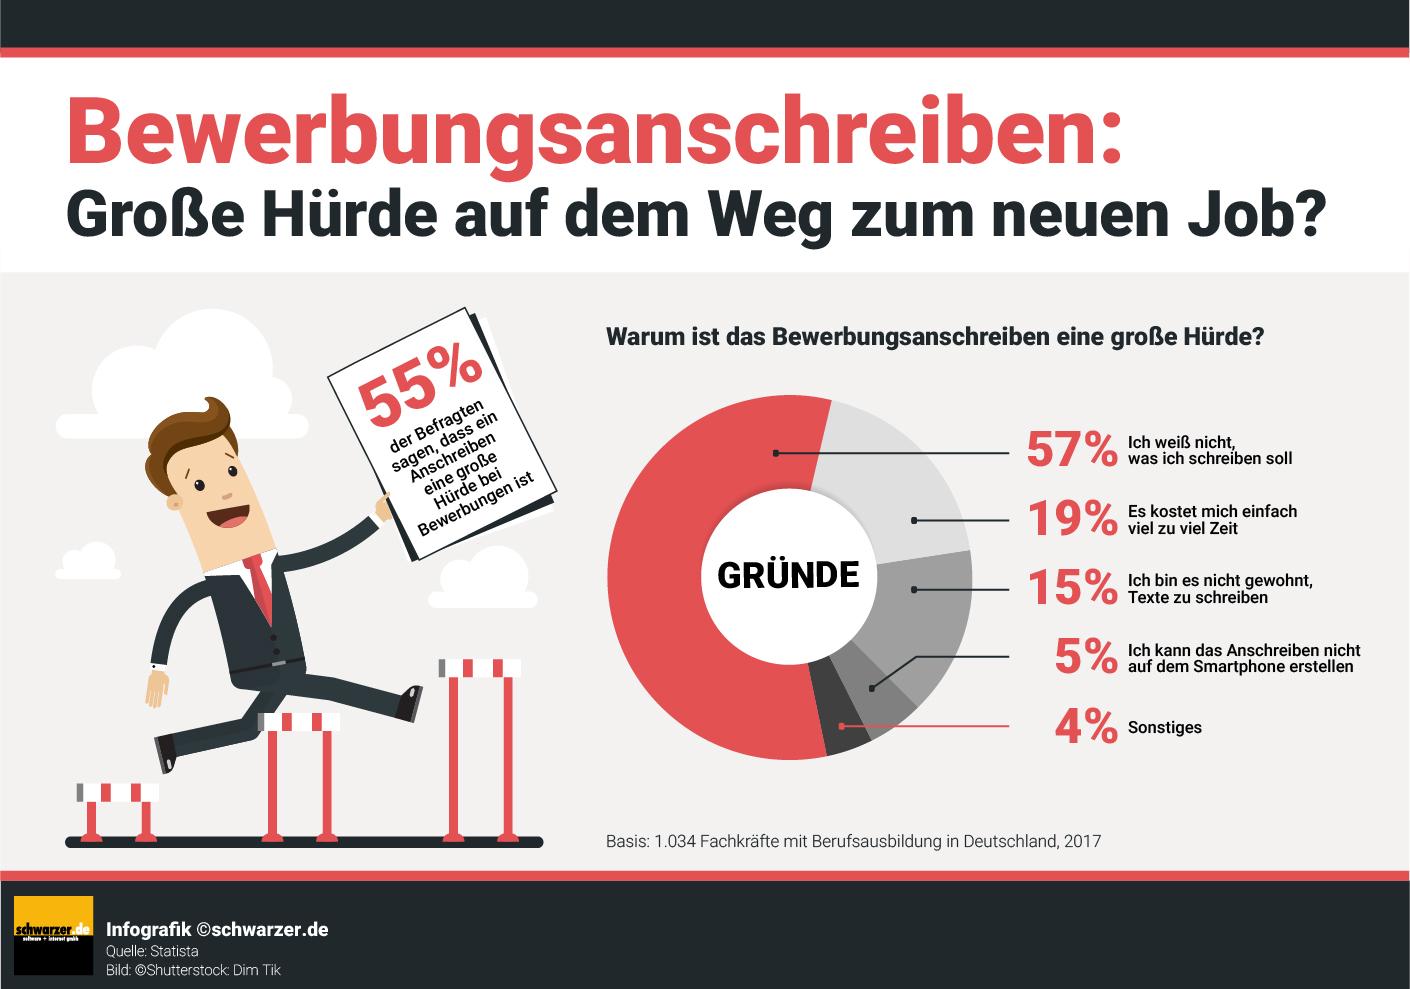 Infografik: Bewerbungsanschreiben - Hürde auf dem Weg zum neuen Job